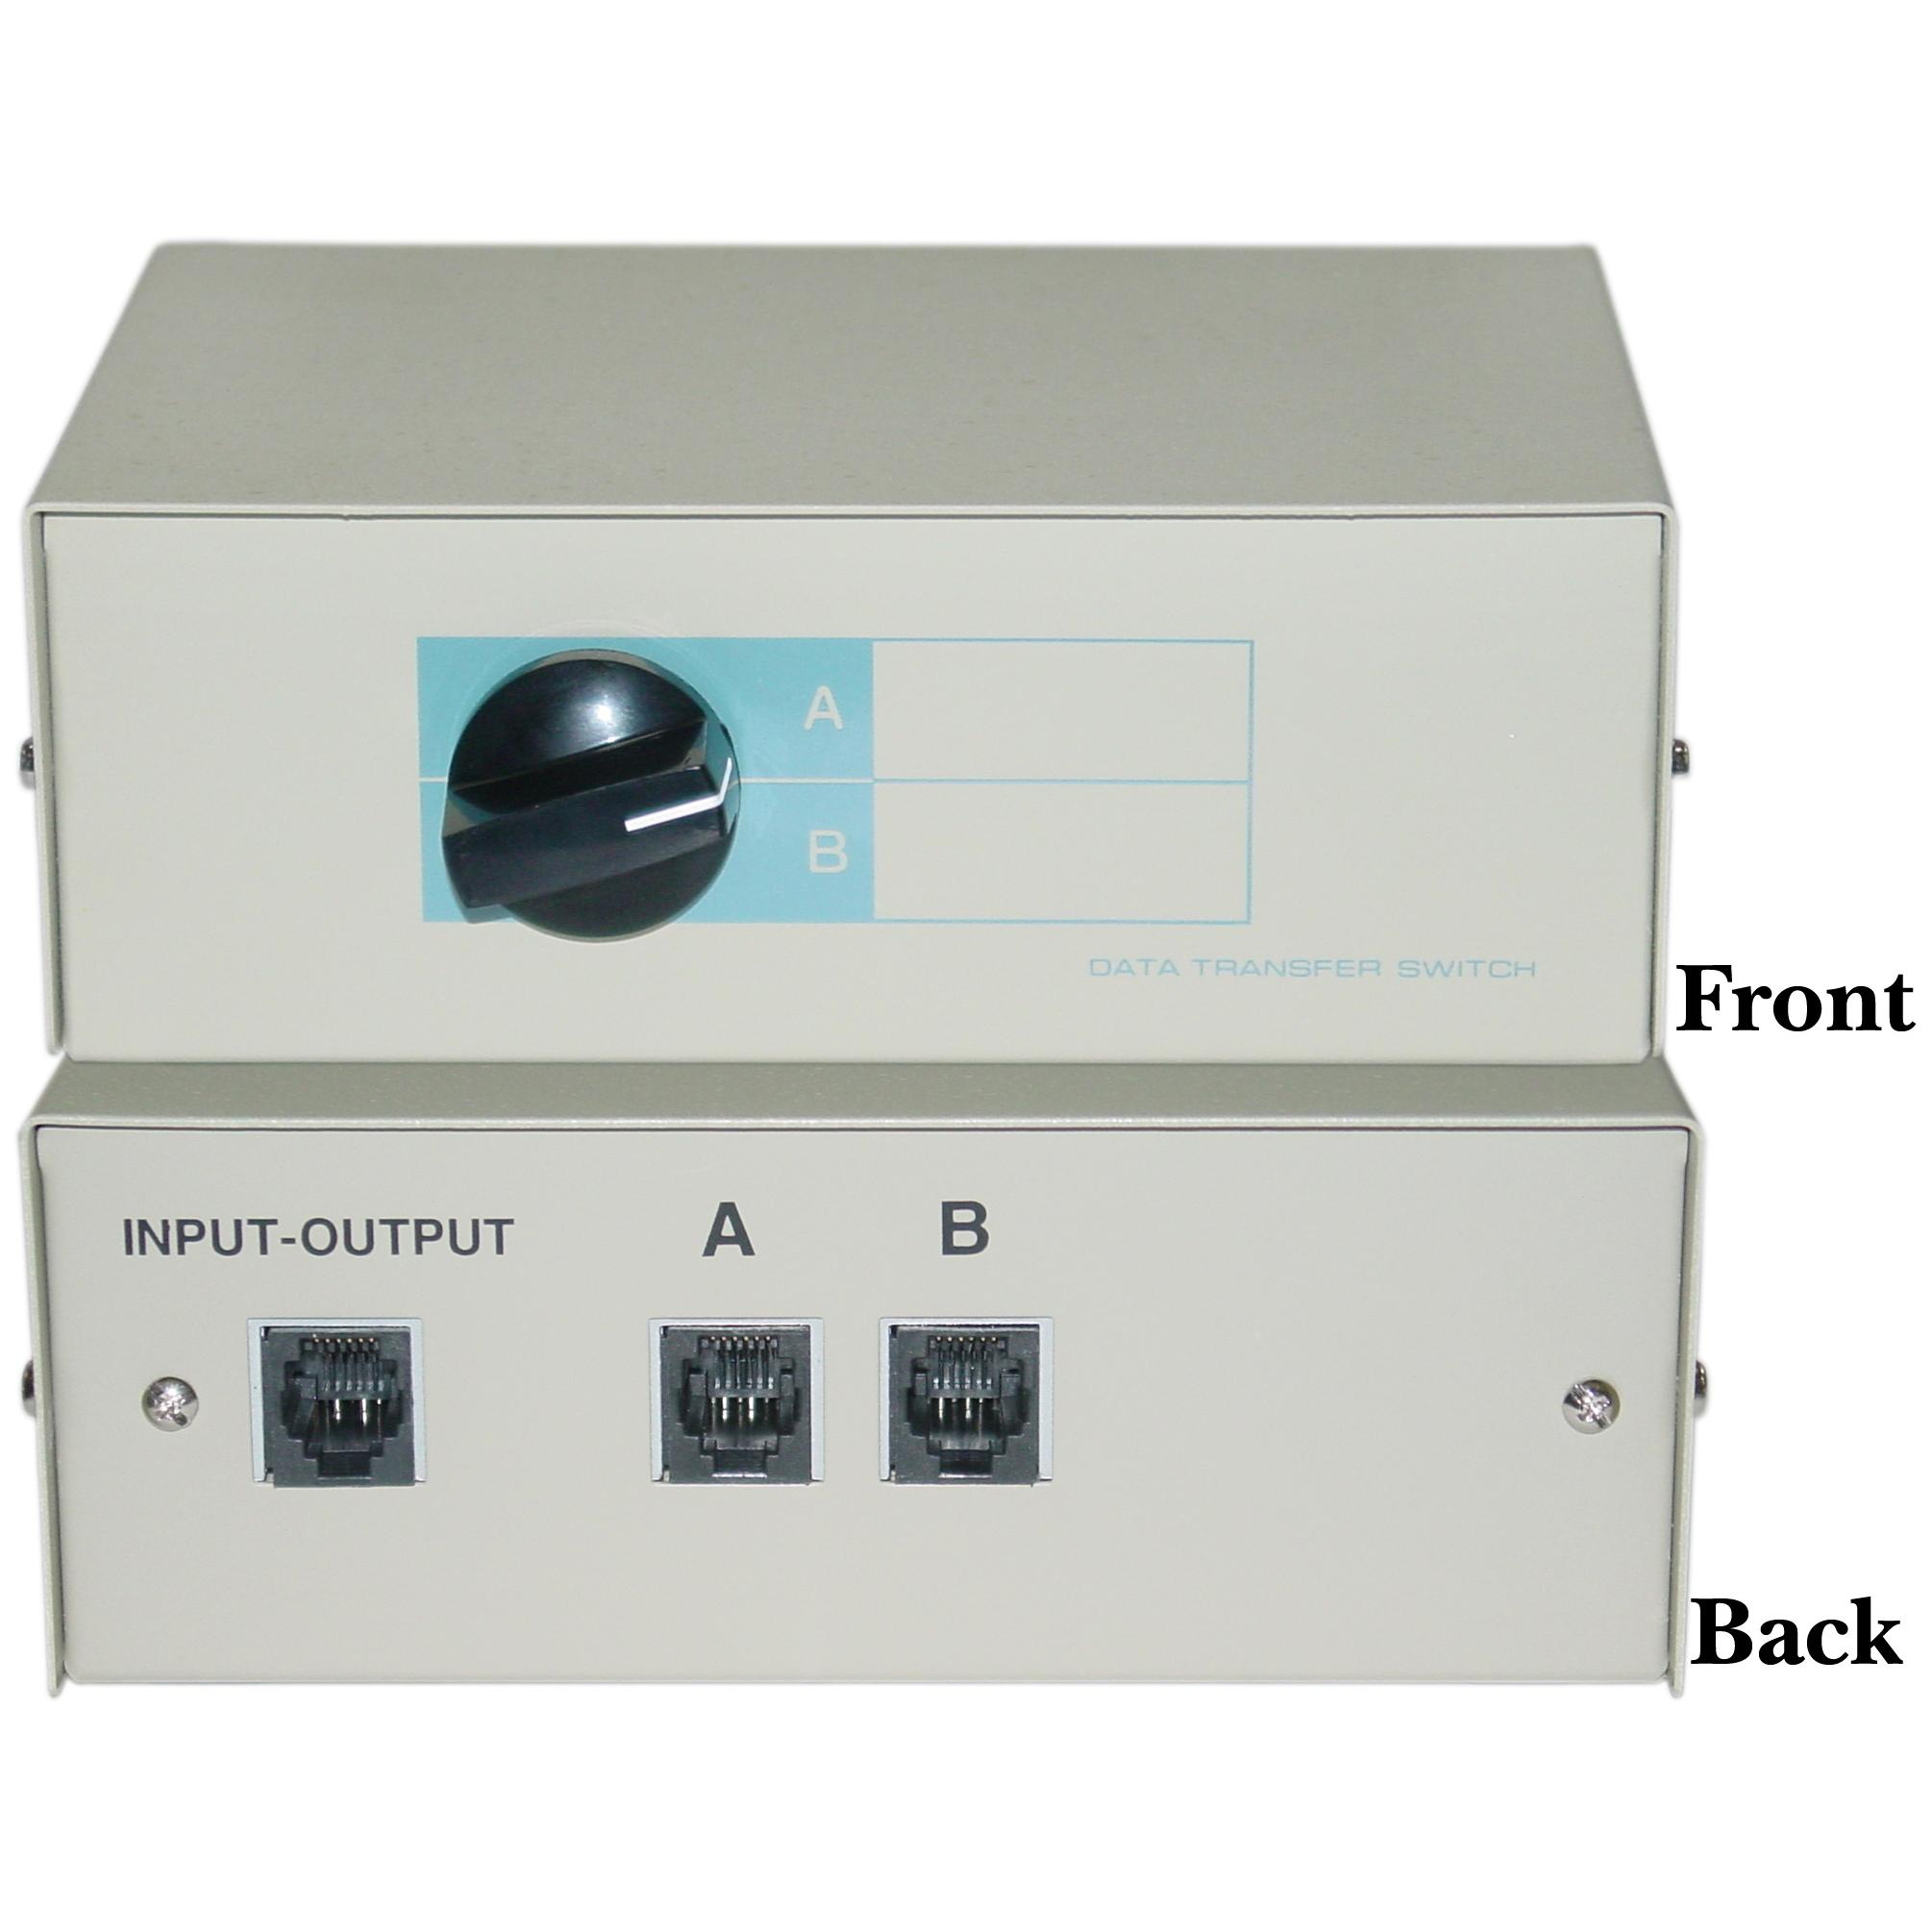 Rj11 Or Rj12 Manual Switch Box